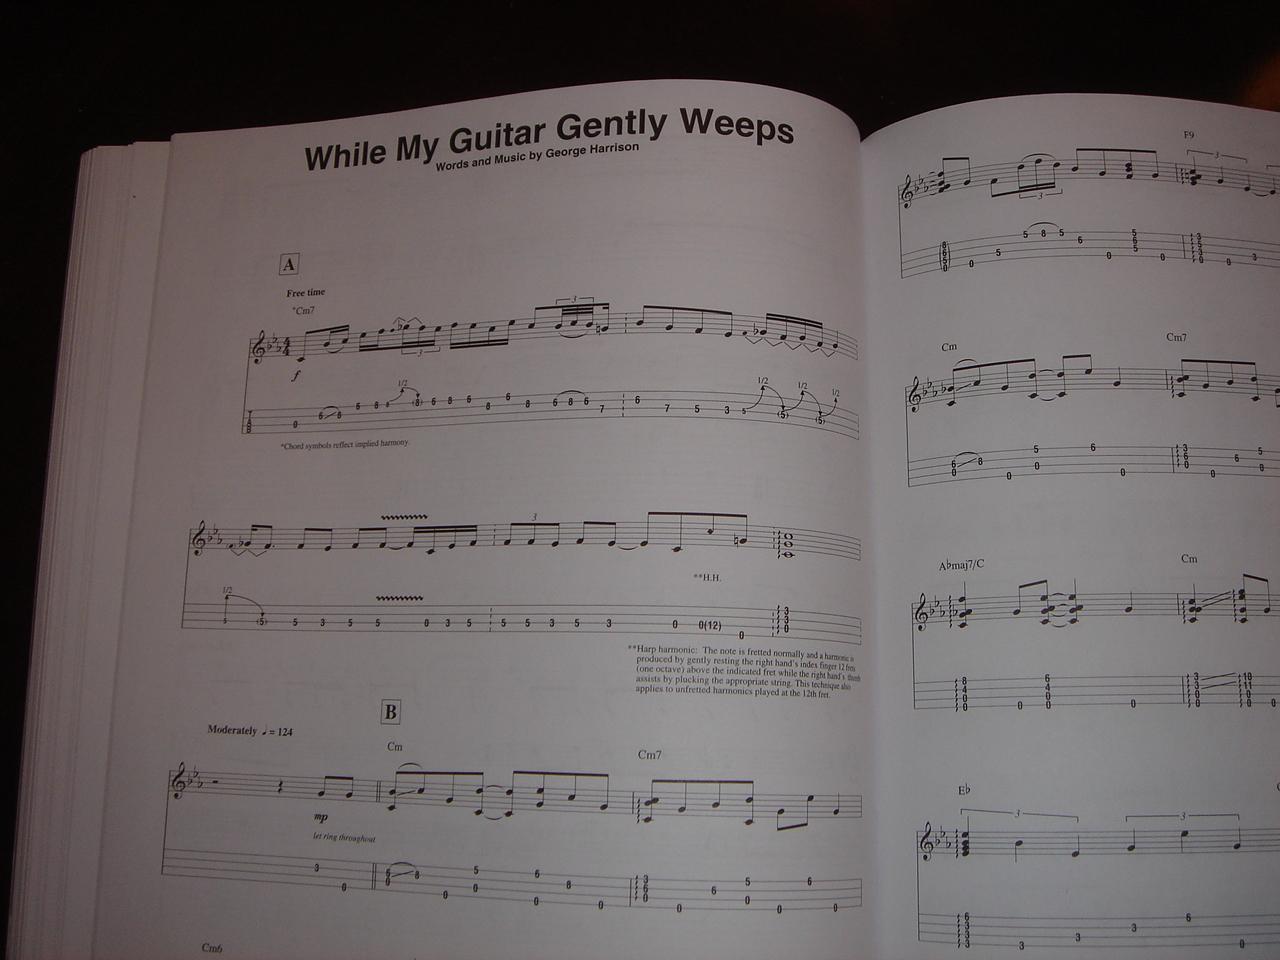 Still My Guitar Gently Weeps Chords